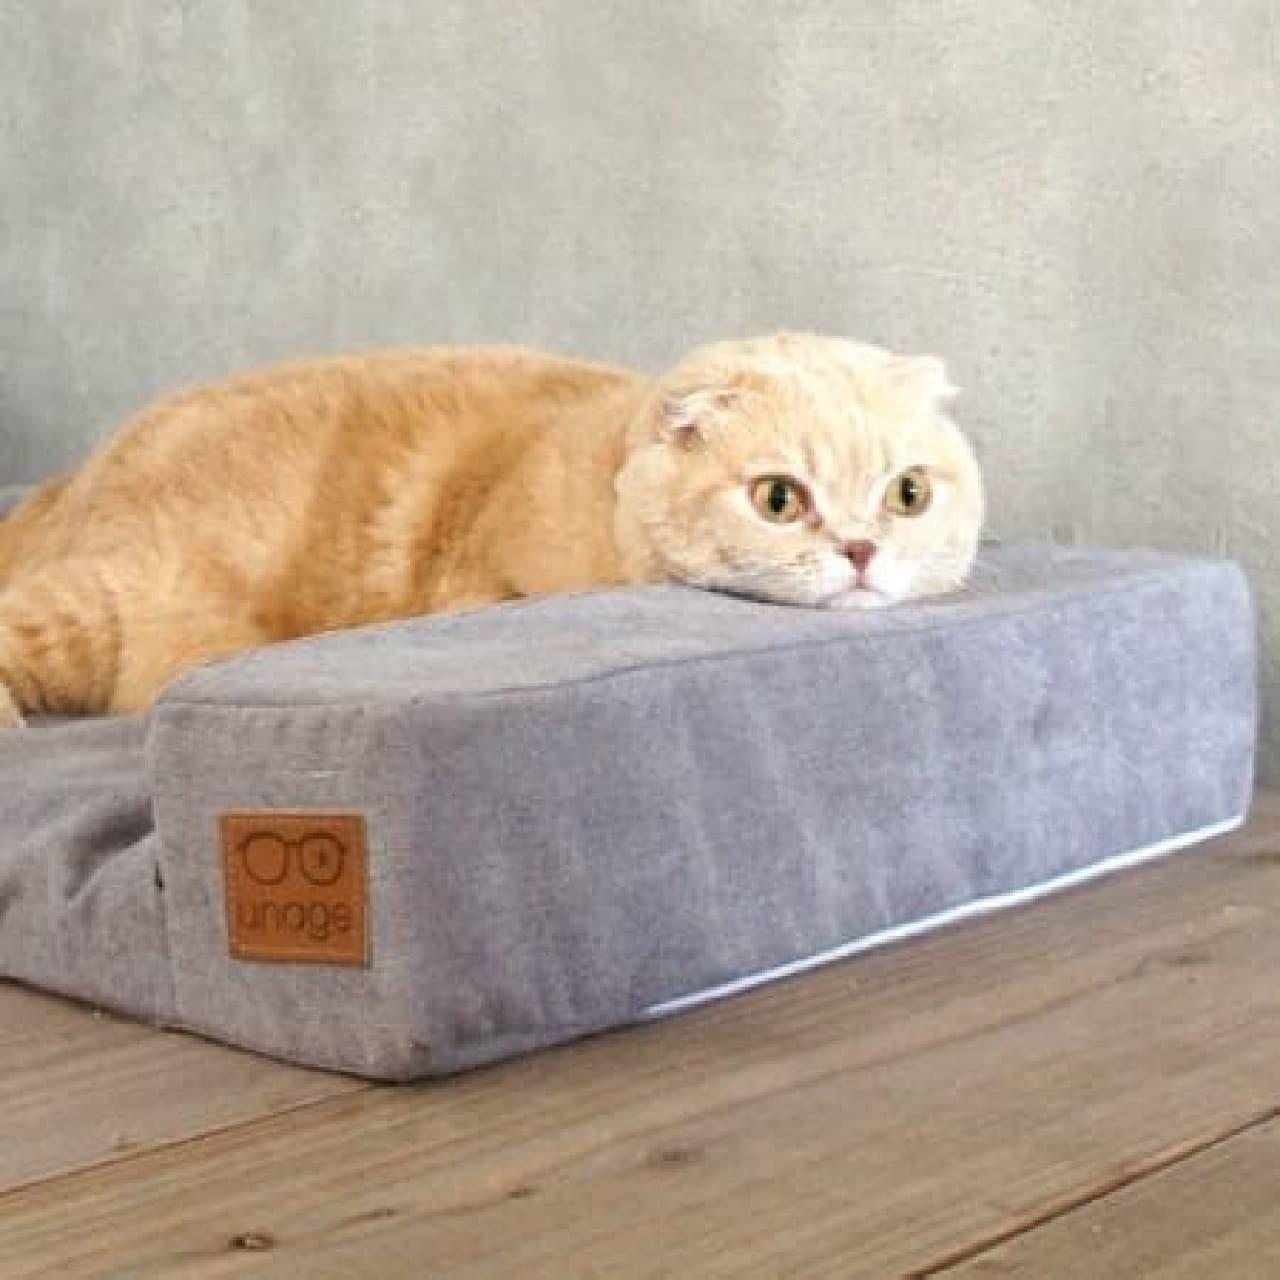 「iDog&iCat」シニアペット向け介護ベッド